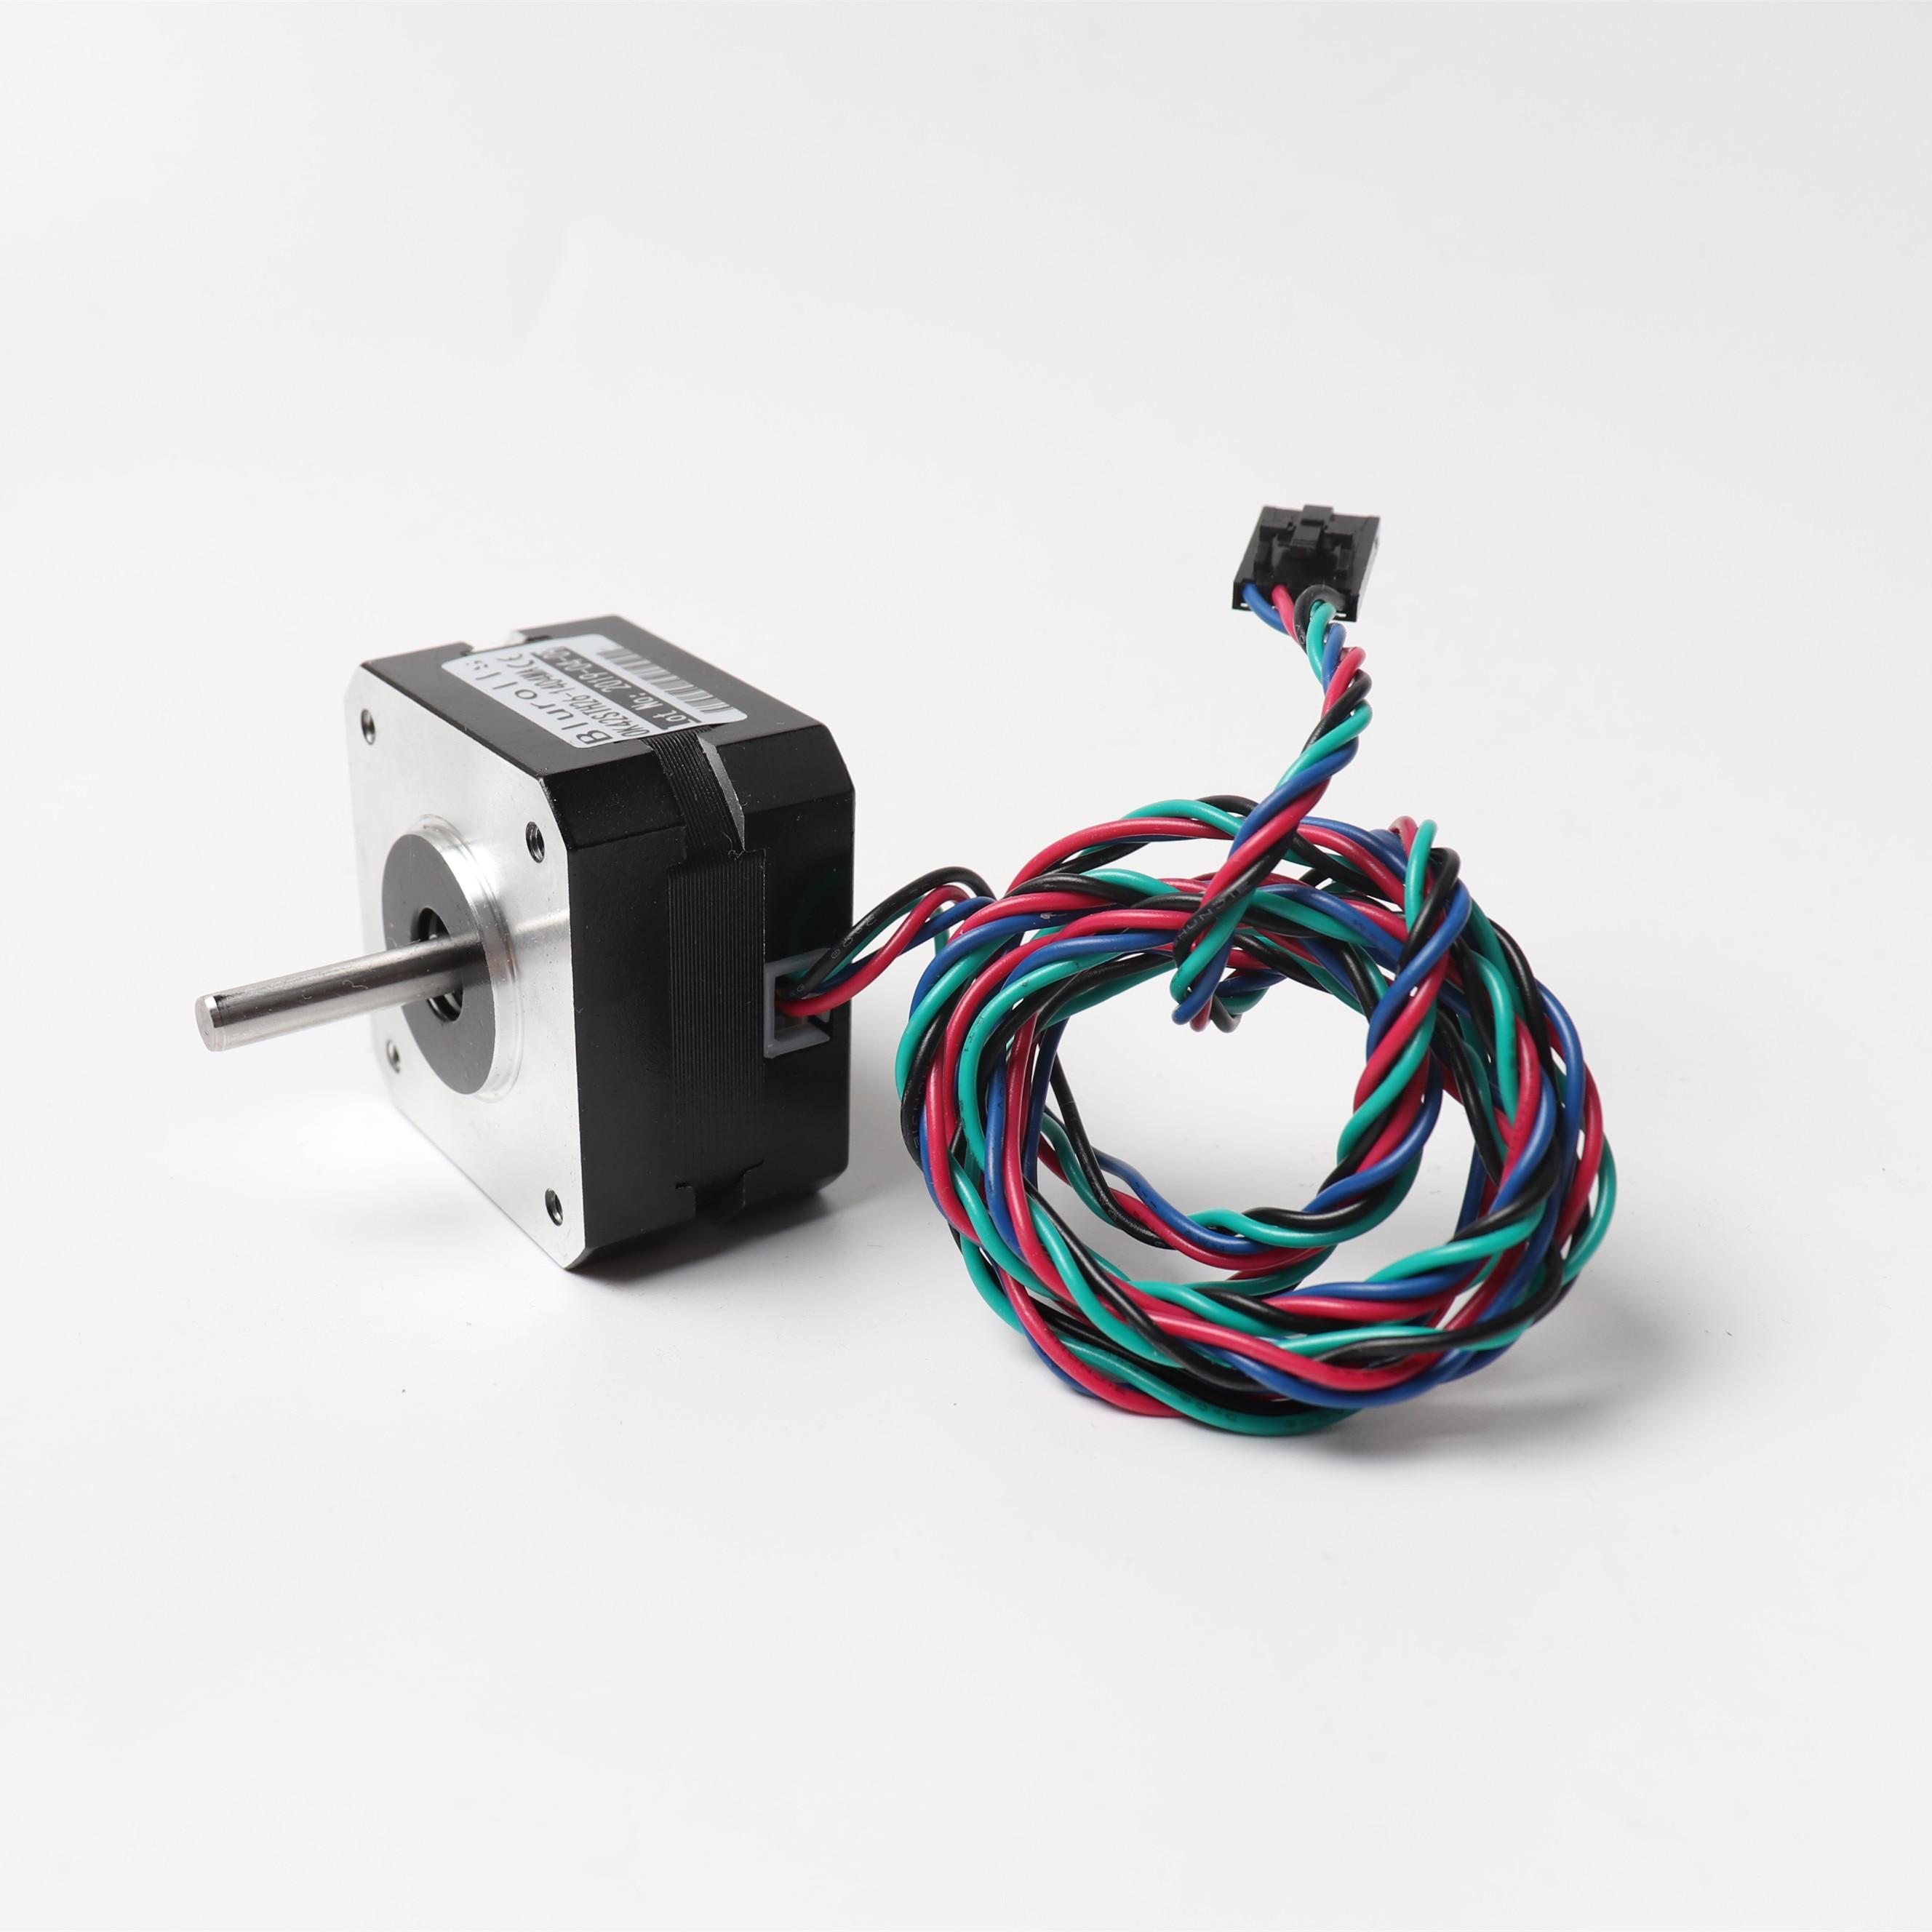 0.9/1.8 Angle Pancake stepper motor for Prusa i3 MK3/MK3S extruder